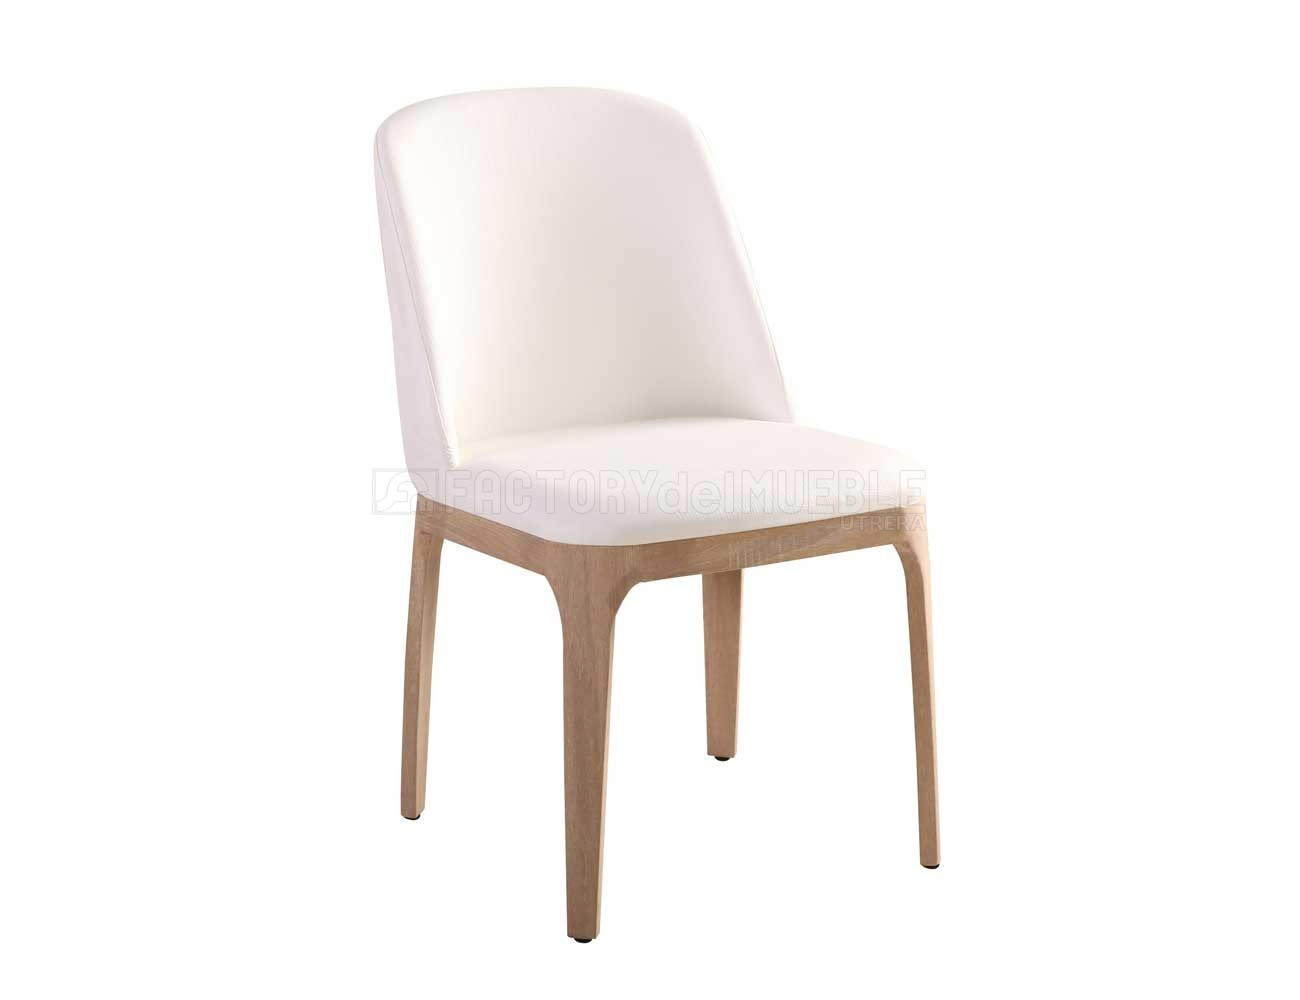 Sillas blancas tapizadas caf usado silla de comedor for Sillas blancas tapizadas